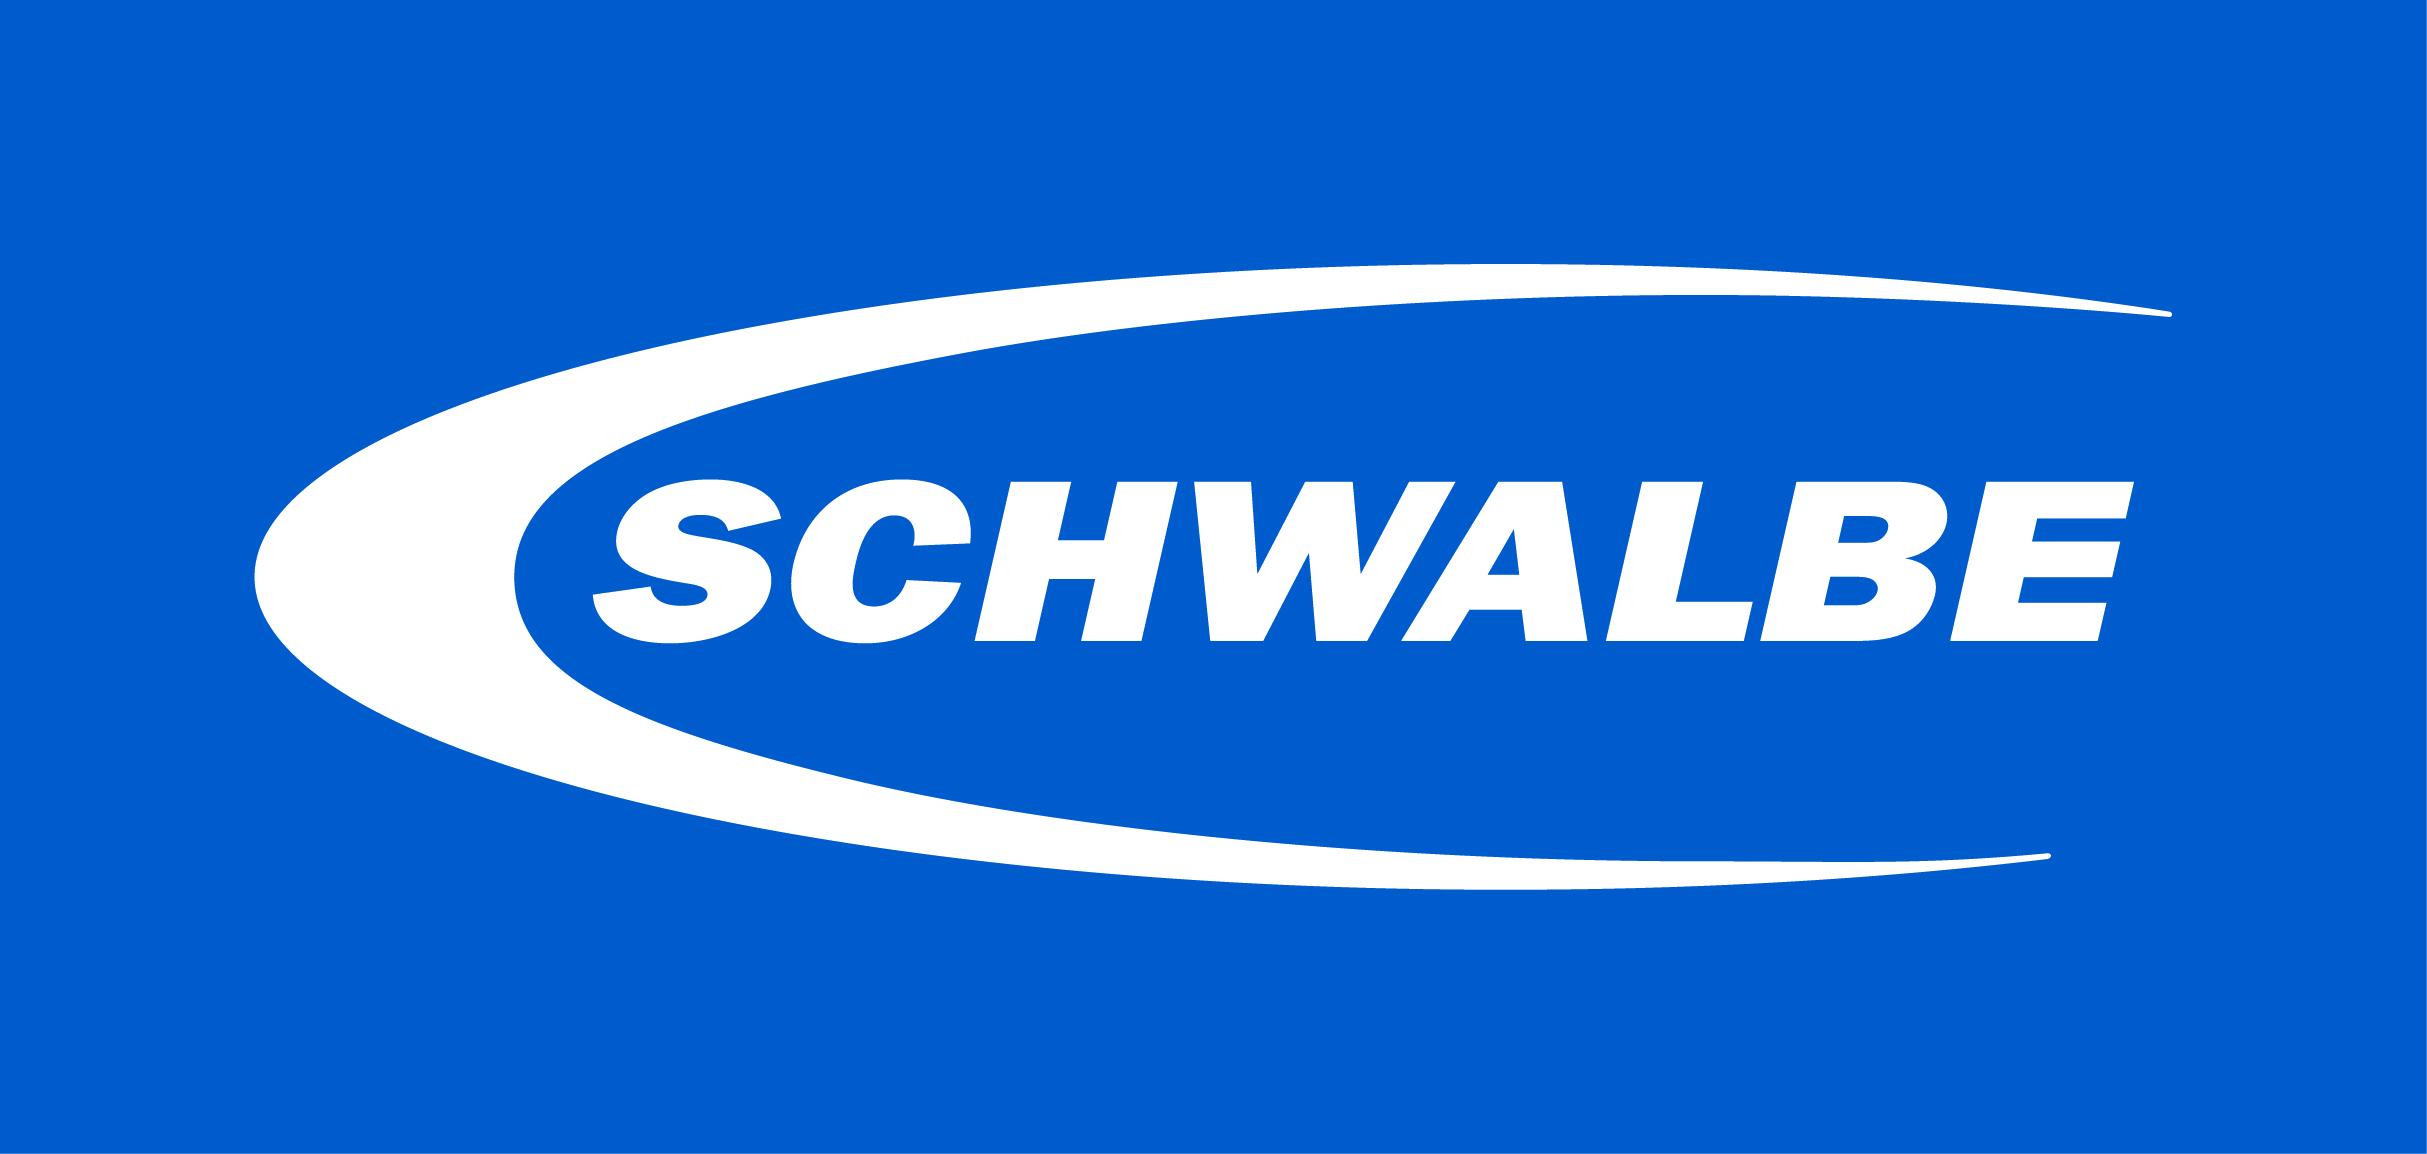 Schwalbe - World-Klapp Sponsor